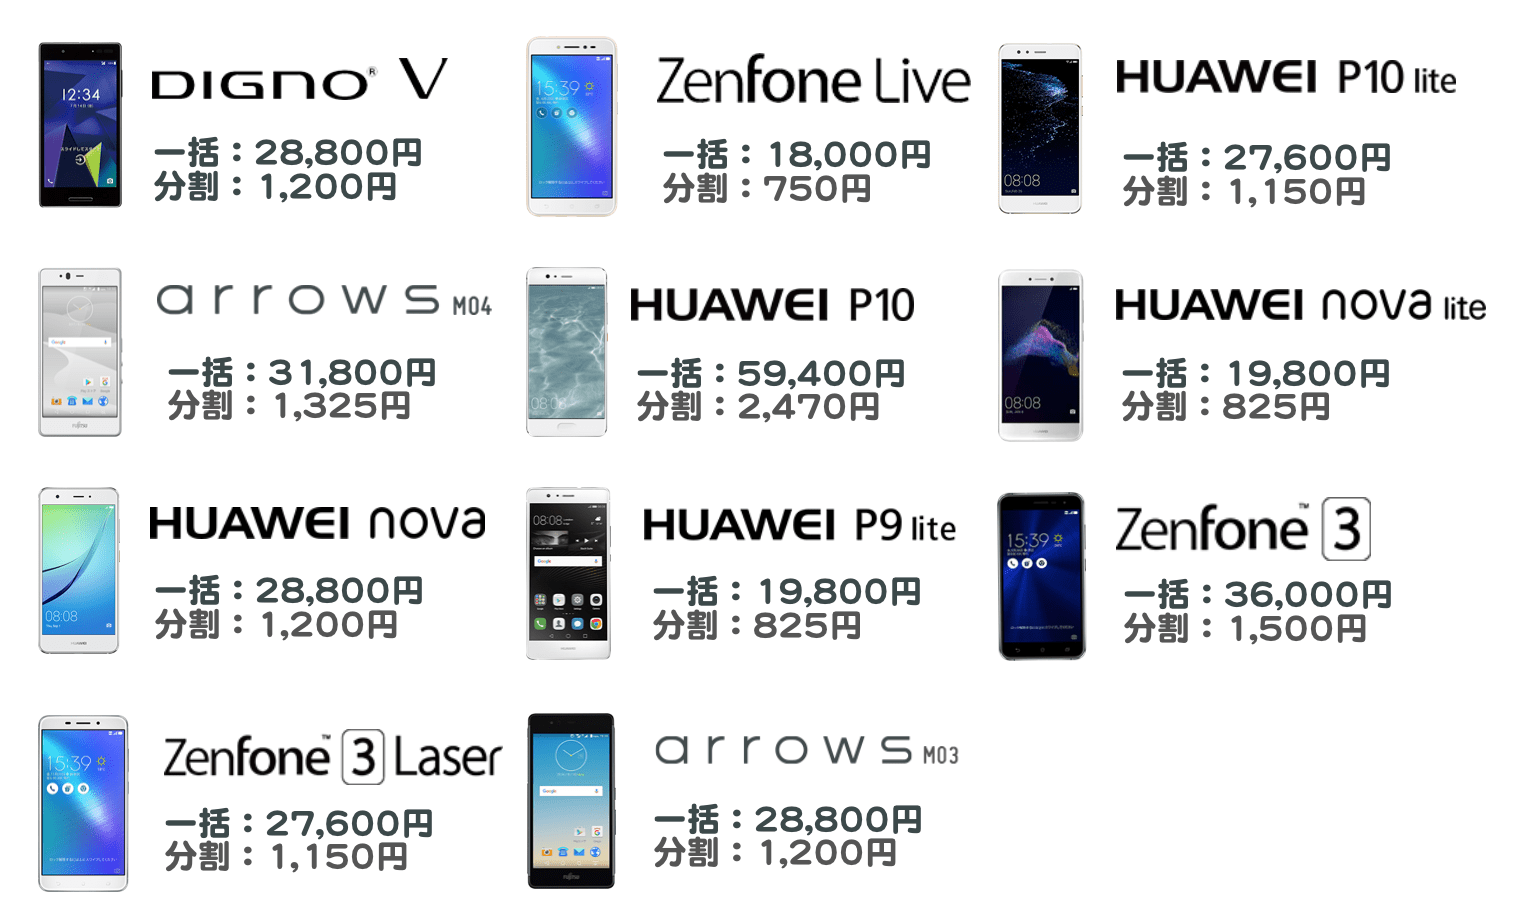 mineoでセット購入できるスマホ端末一覧。一括支払いの場合の料金と、分割払いの場合の料金。DIGNO V、Zenfone Live、HUAWEI P10 lite、arrows M04、HUAWEI P10、HUAWEI nova lite、HUAWEI nova、HUAWEI 9P lite、Zenfone3、Zenfone 3 Laser、arrows M03。